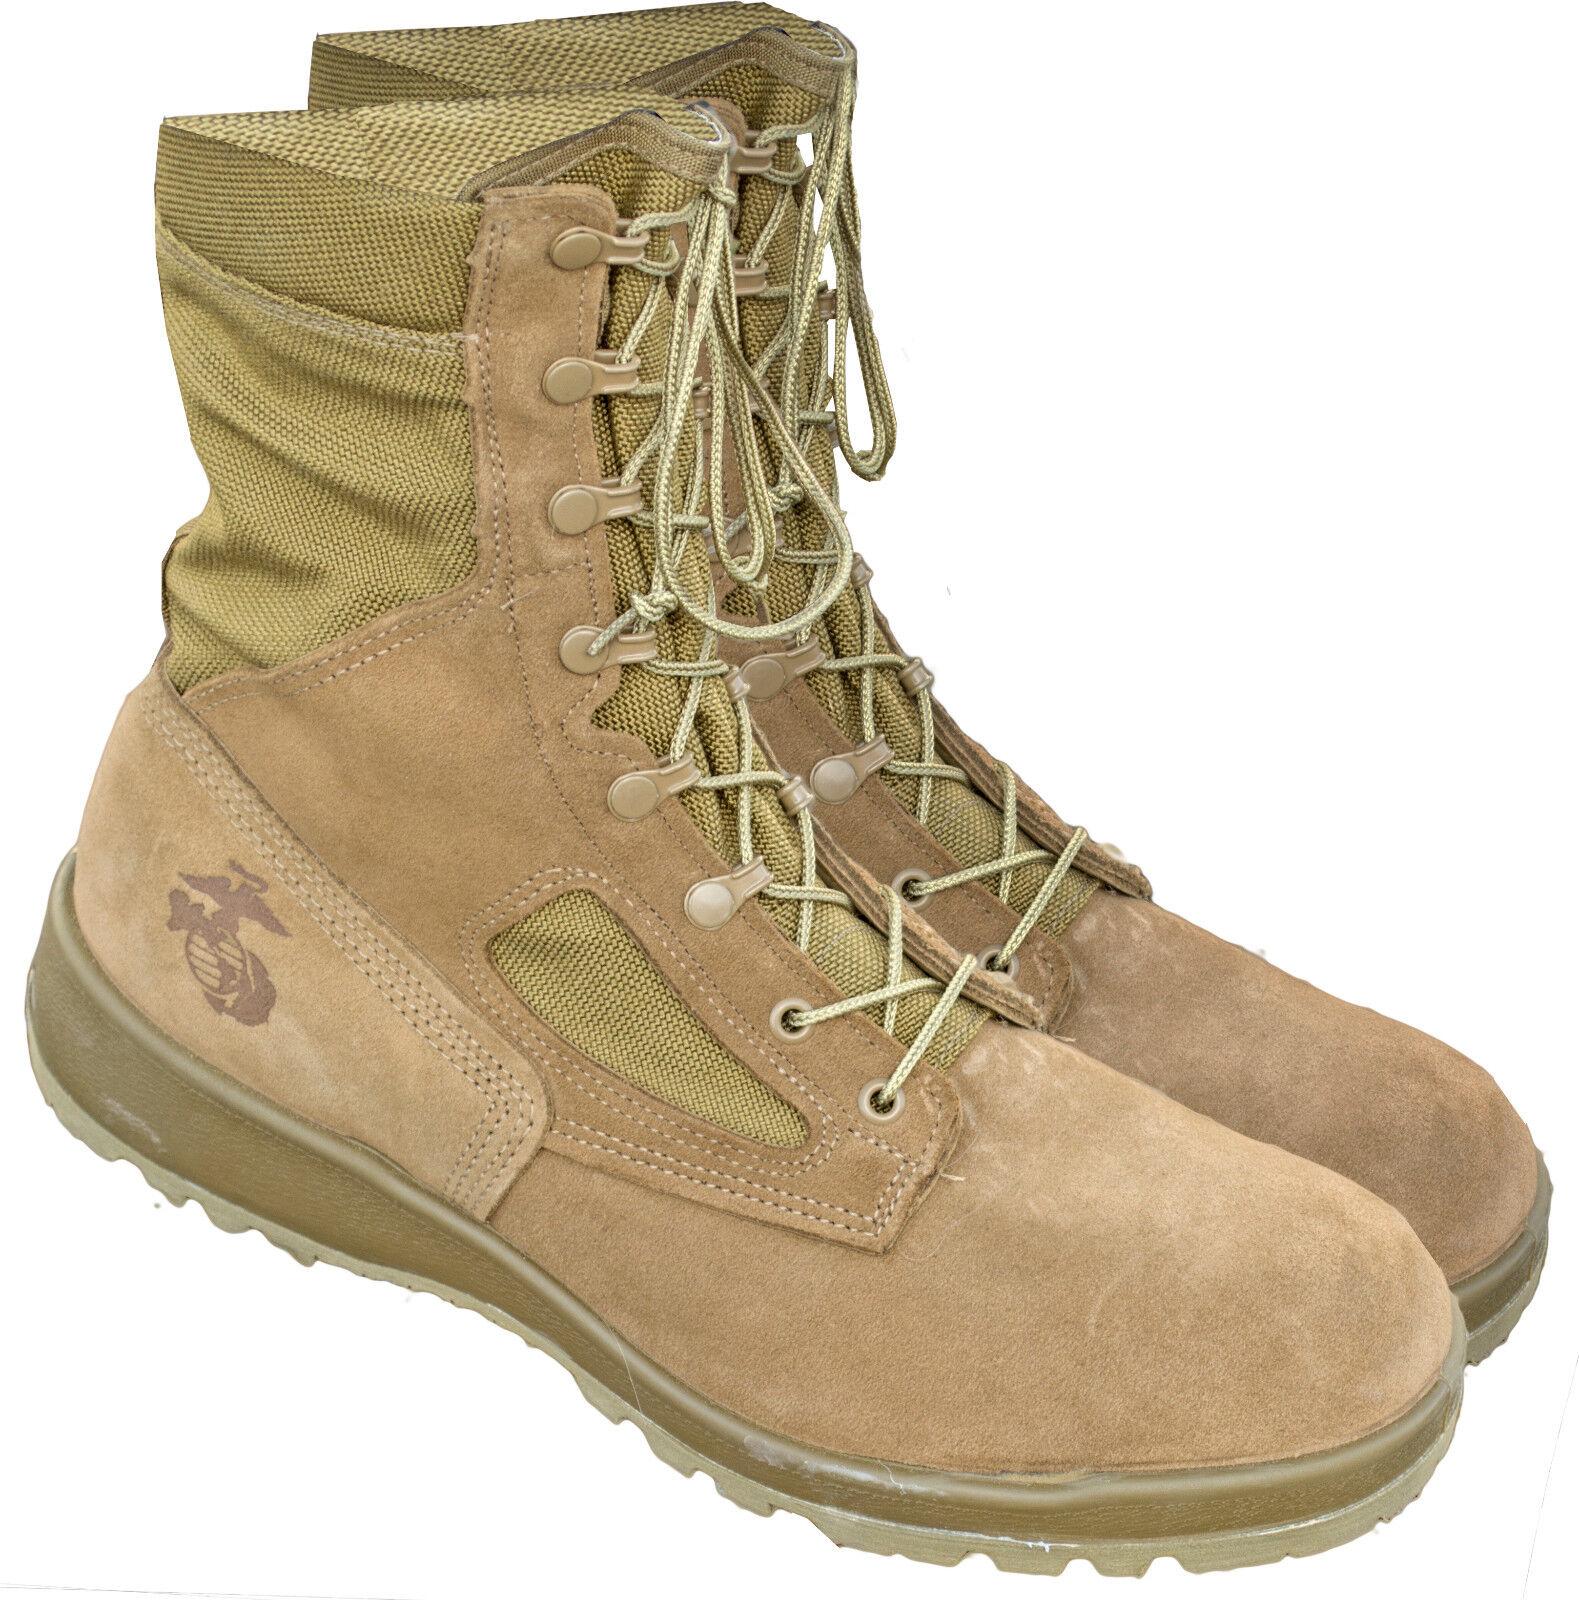 U.S. G.I. USMC Waterproof Combat Boots Size 11.5  wide Bates